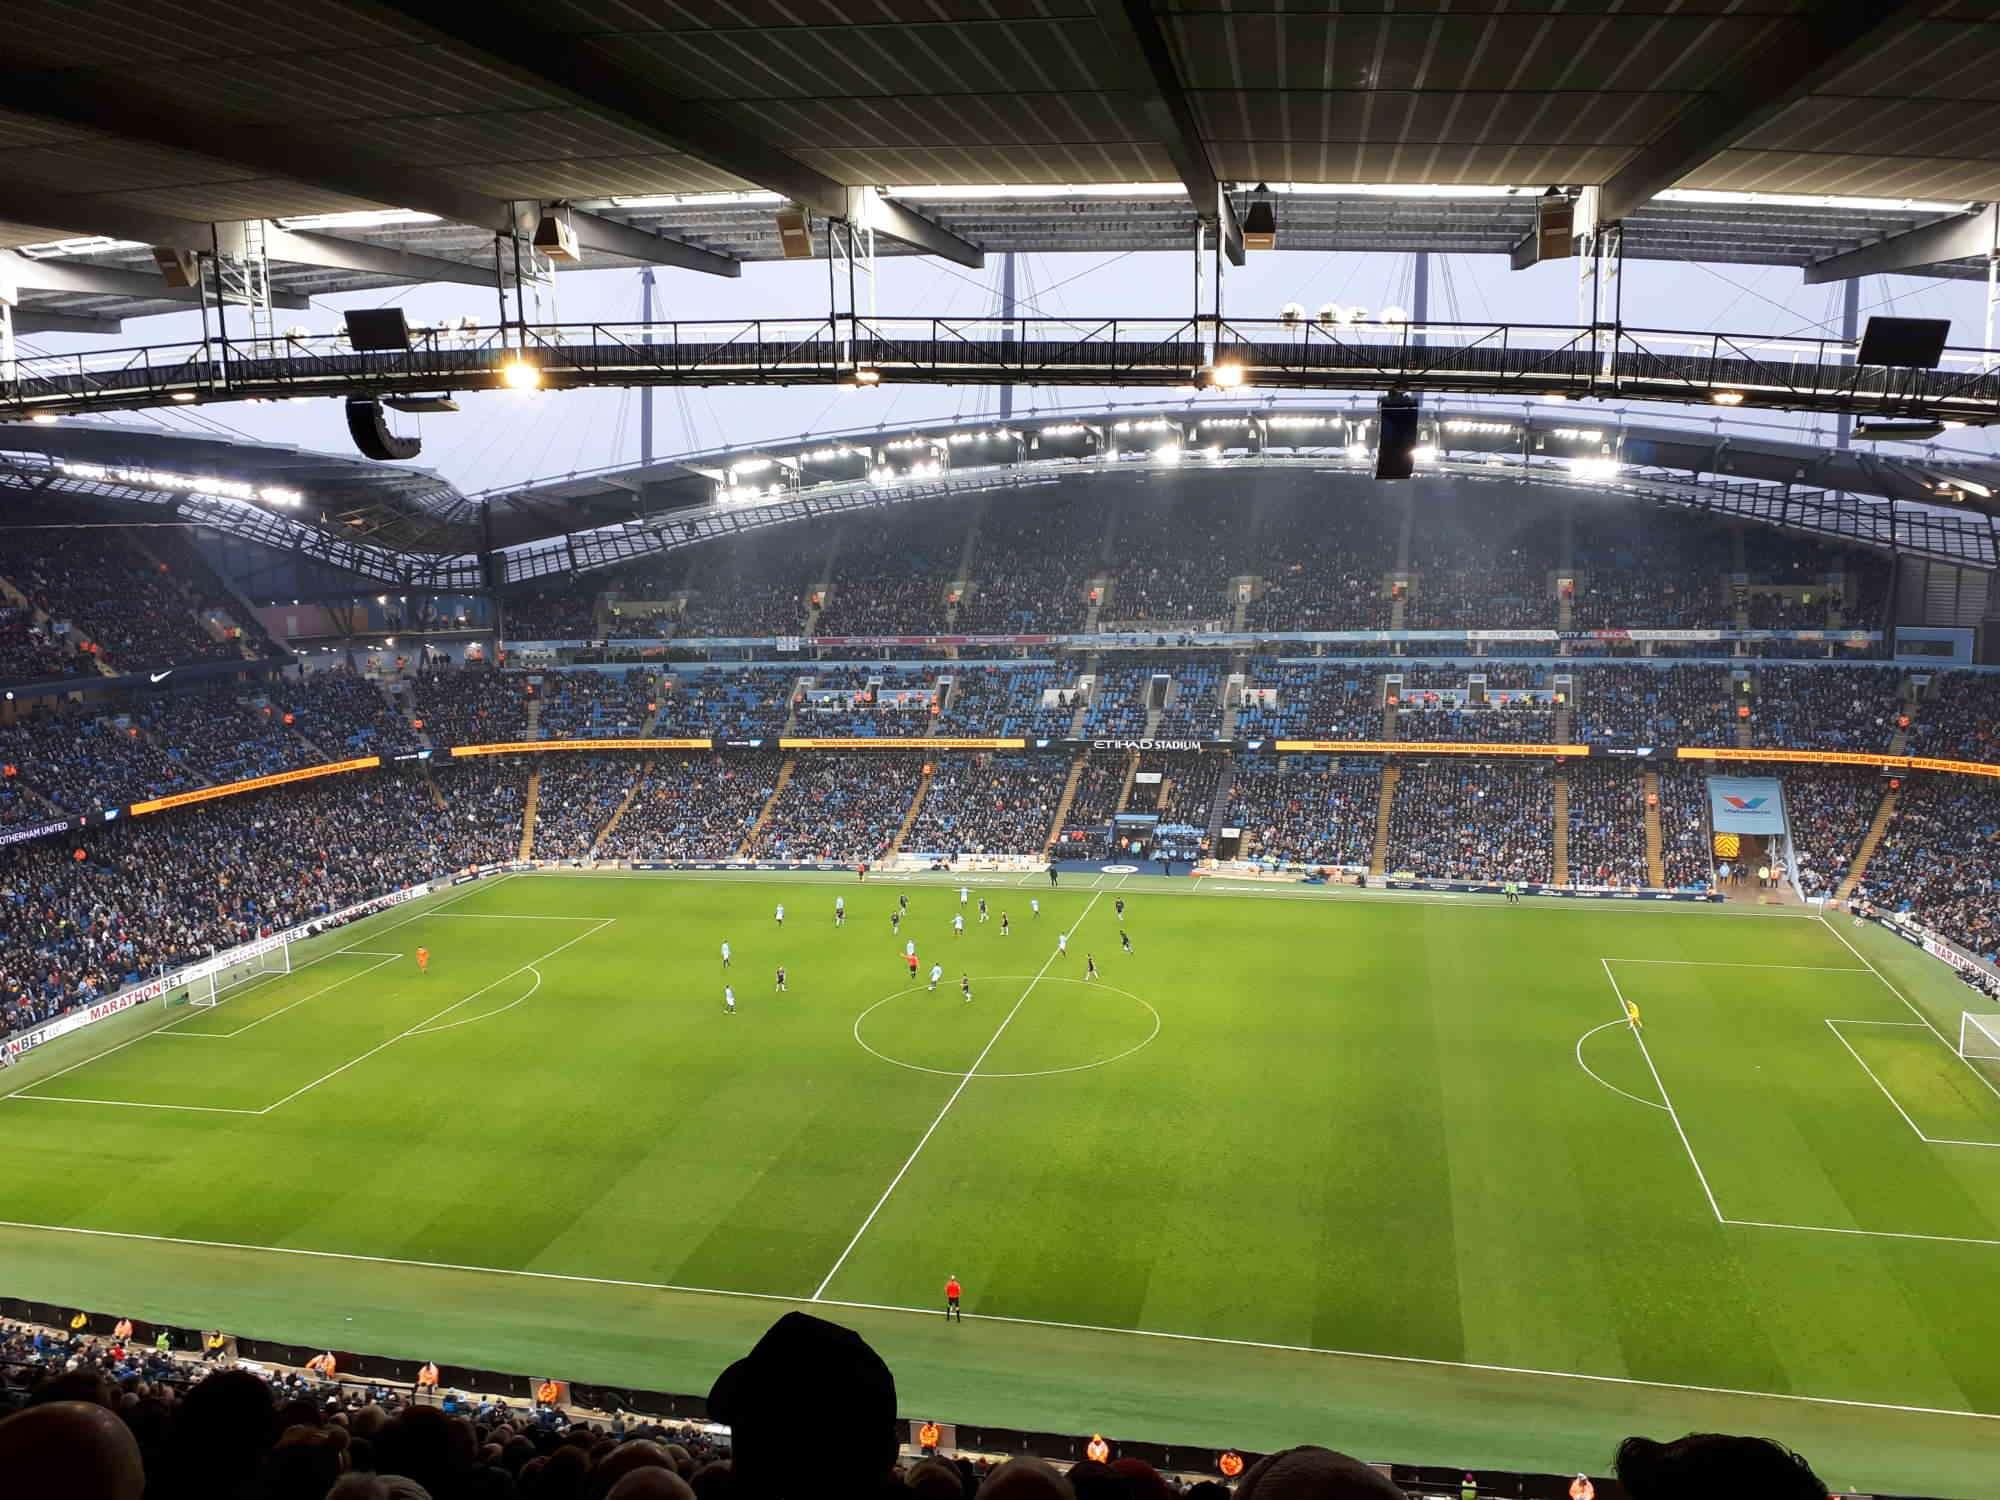 View from Seat Block 304 at Etihad Stadium Manchester